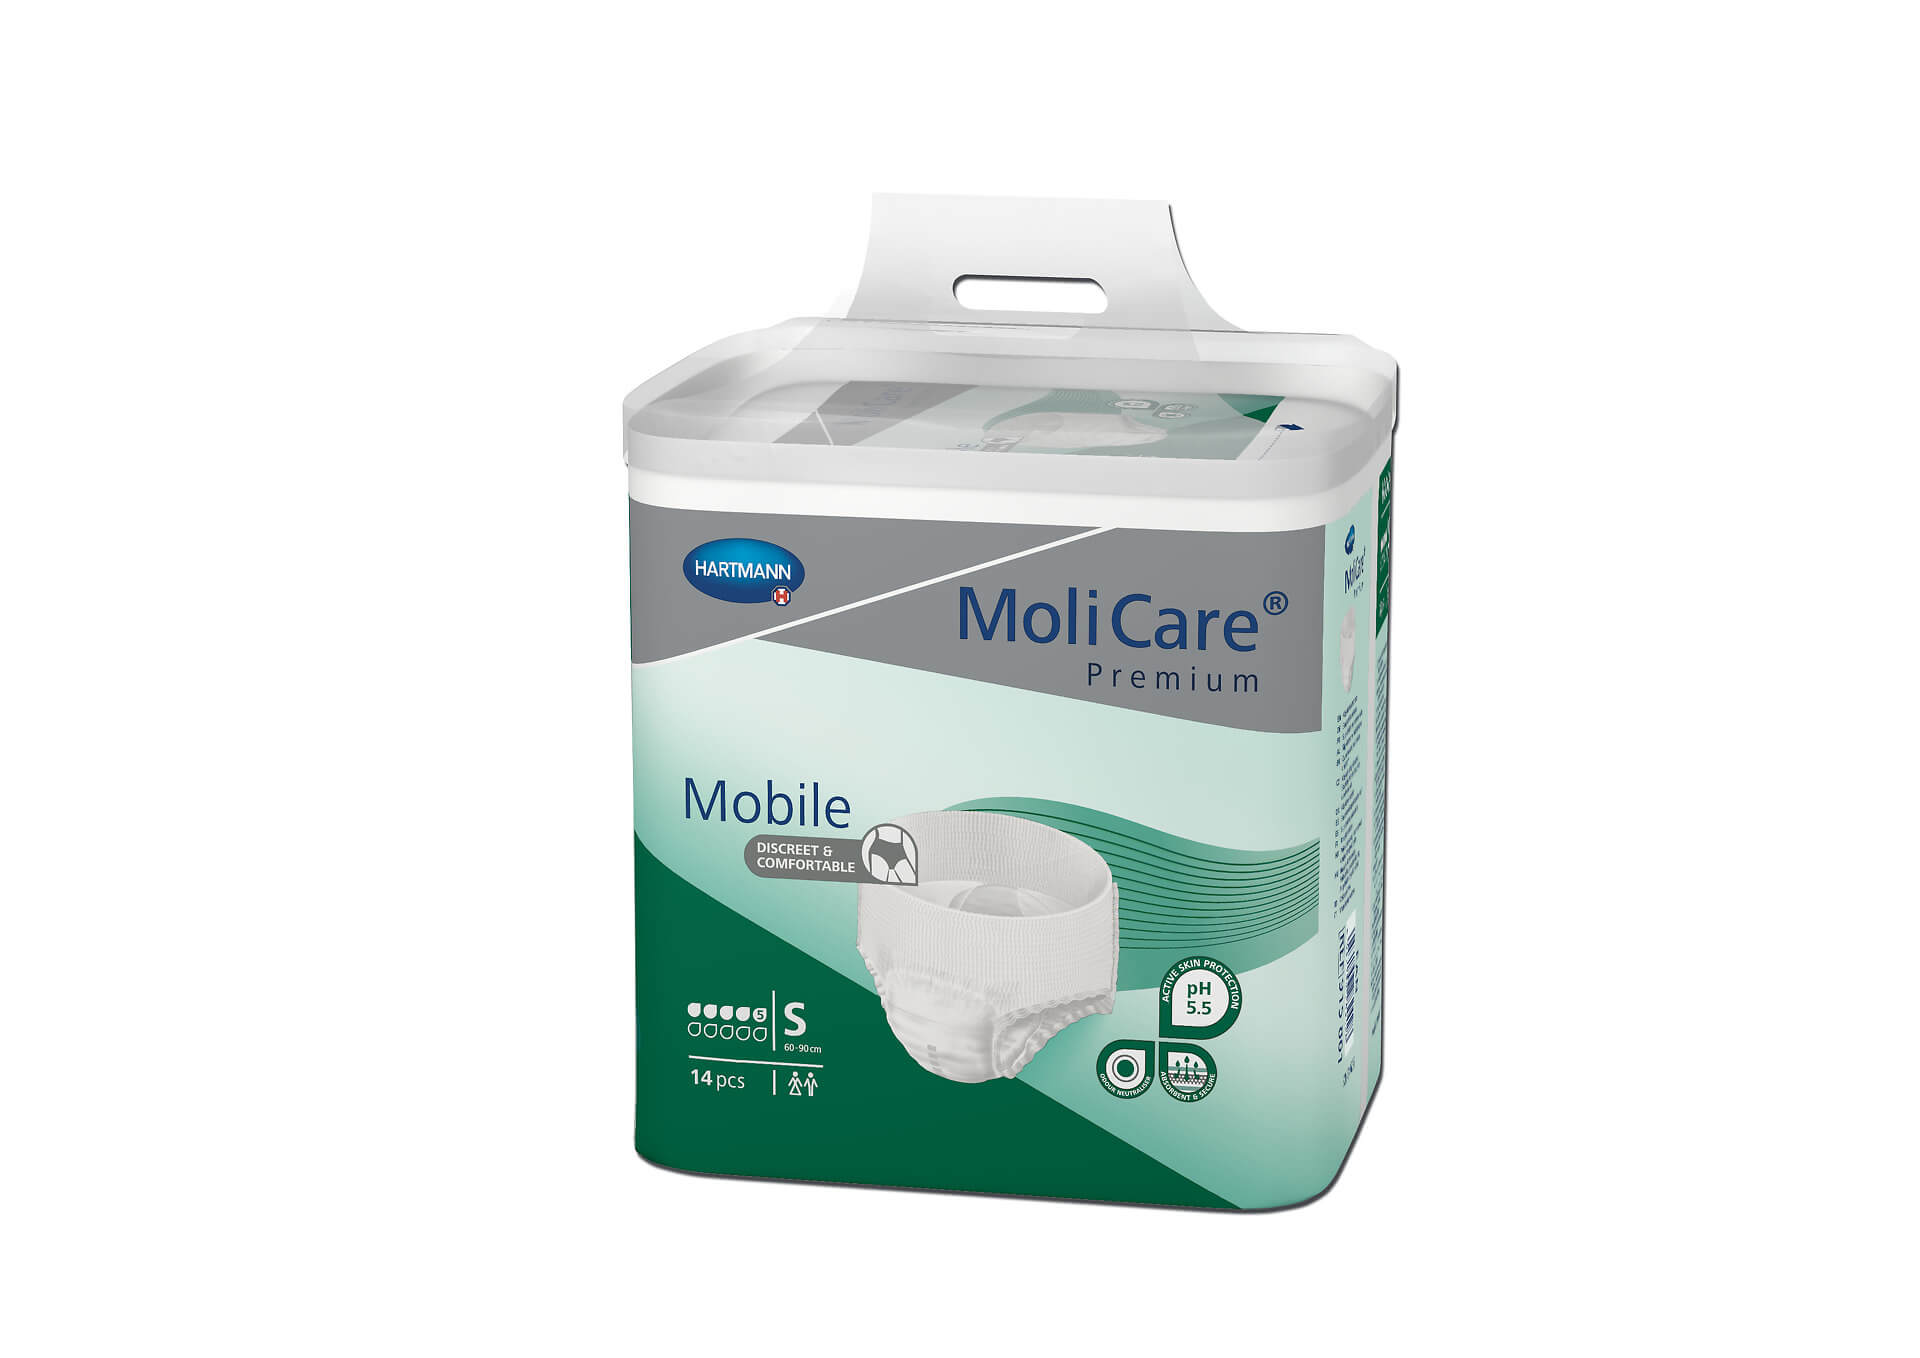 Molicare Premium Mobile Extra